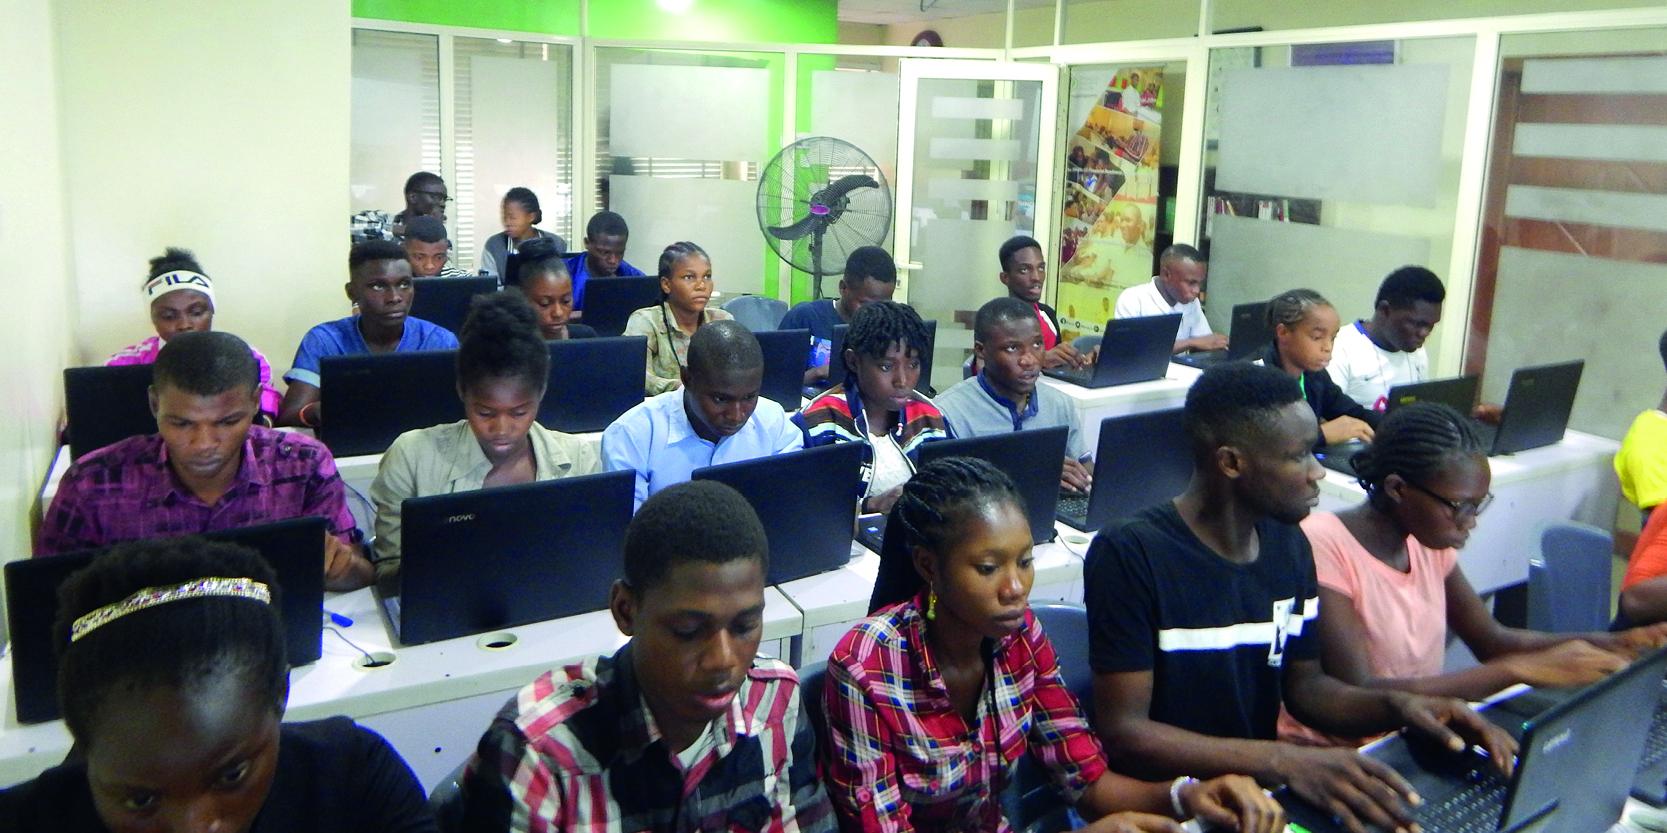 News Brief: Paradigm Initiative Launches a Six-week Virtual Training Program